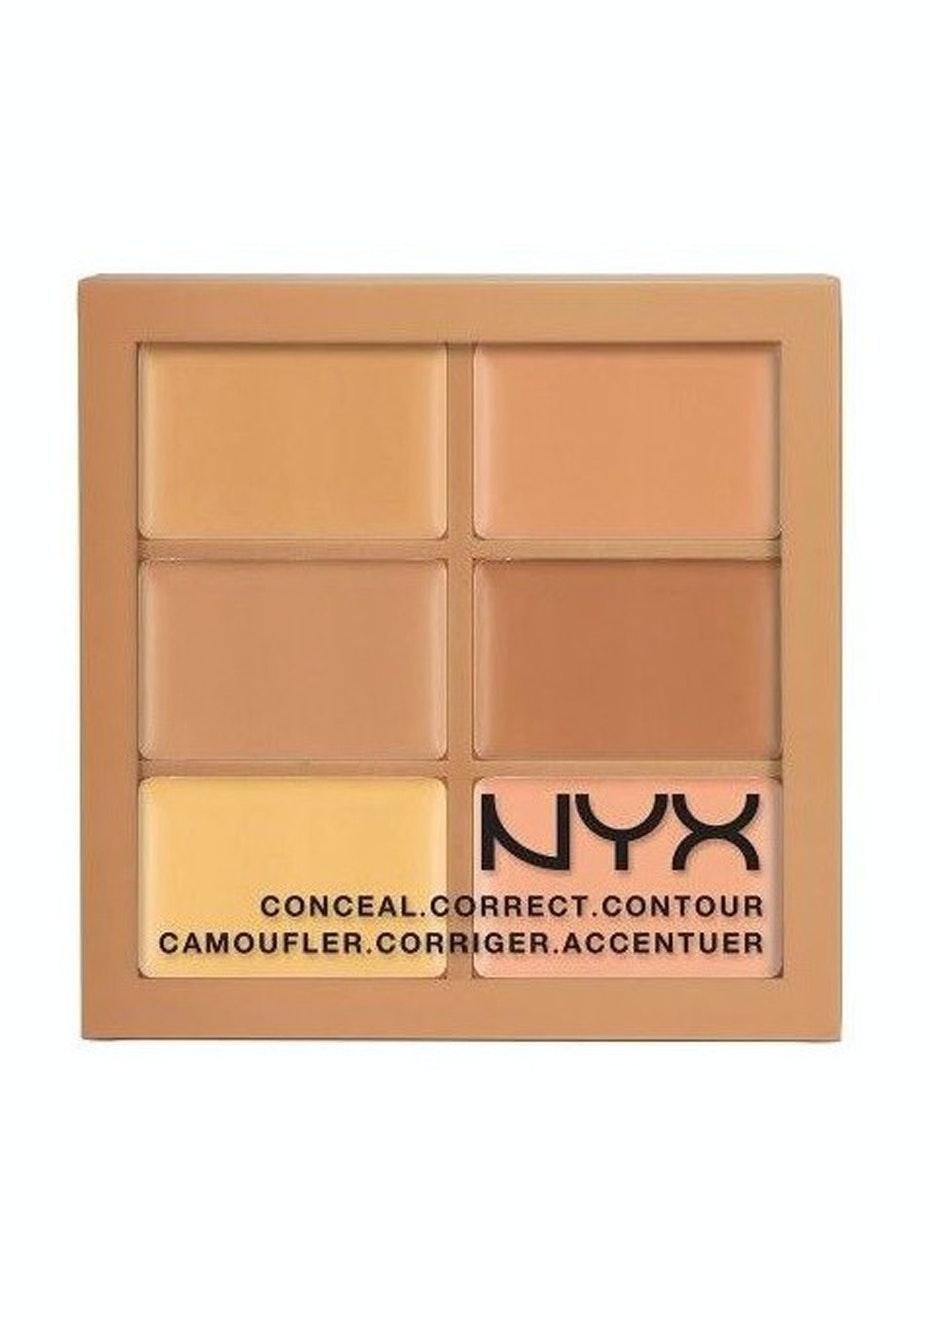 NYX - Conceal, Correct, Contour Palette - Medium